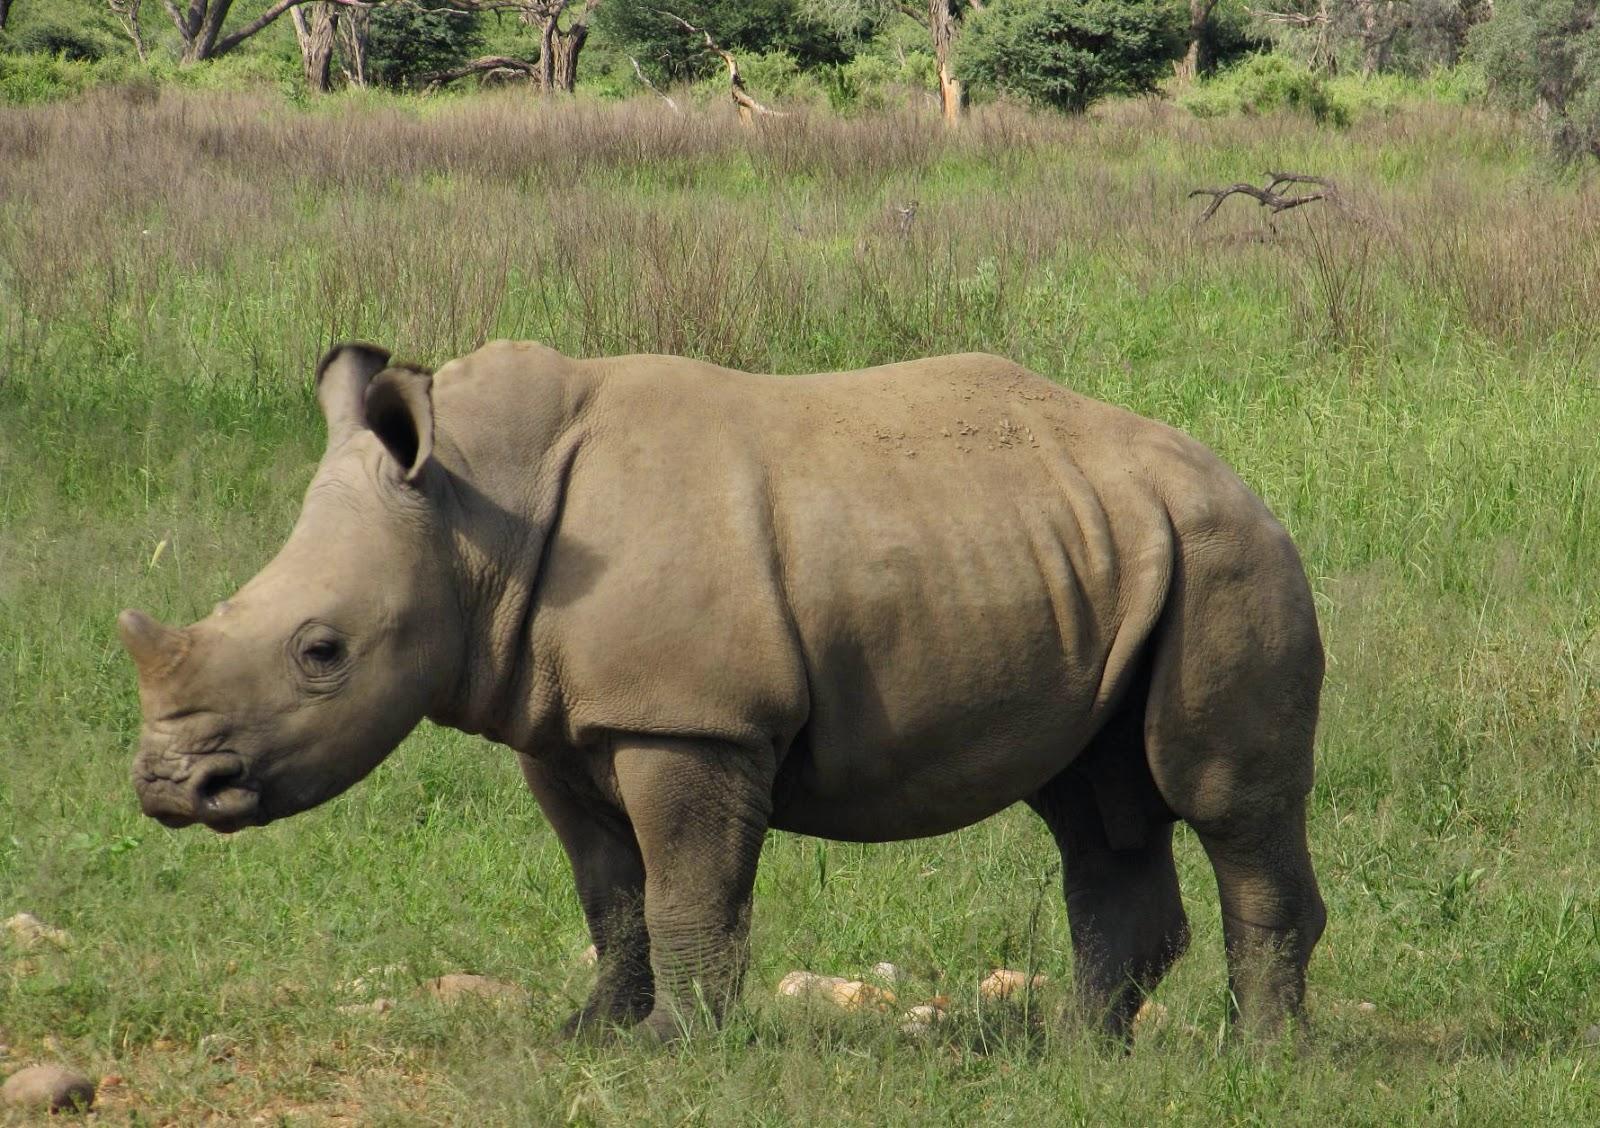 Rhinos & travel to Namibia - www.namibweb.com